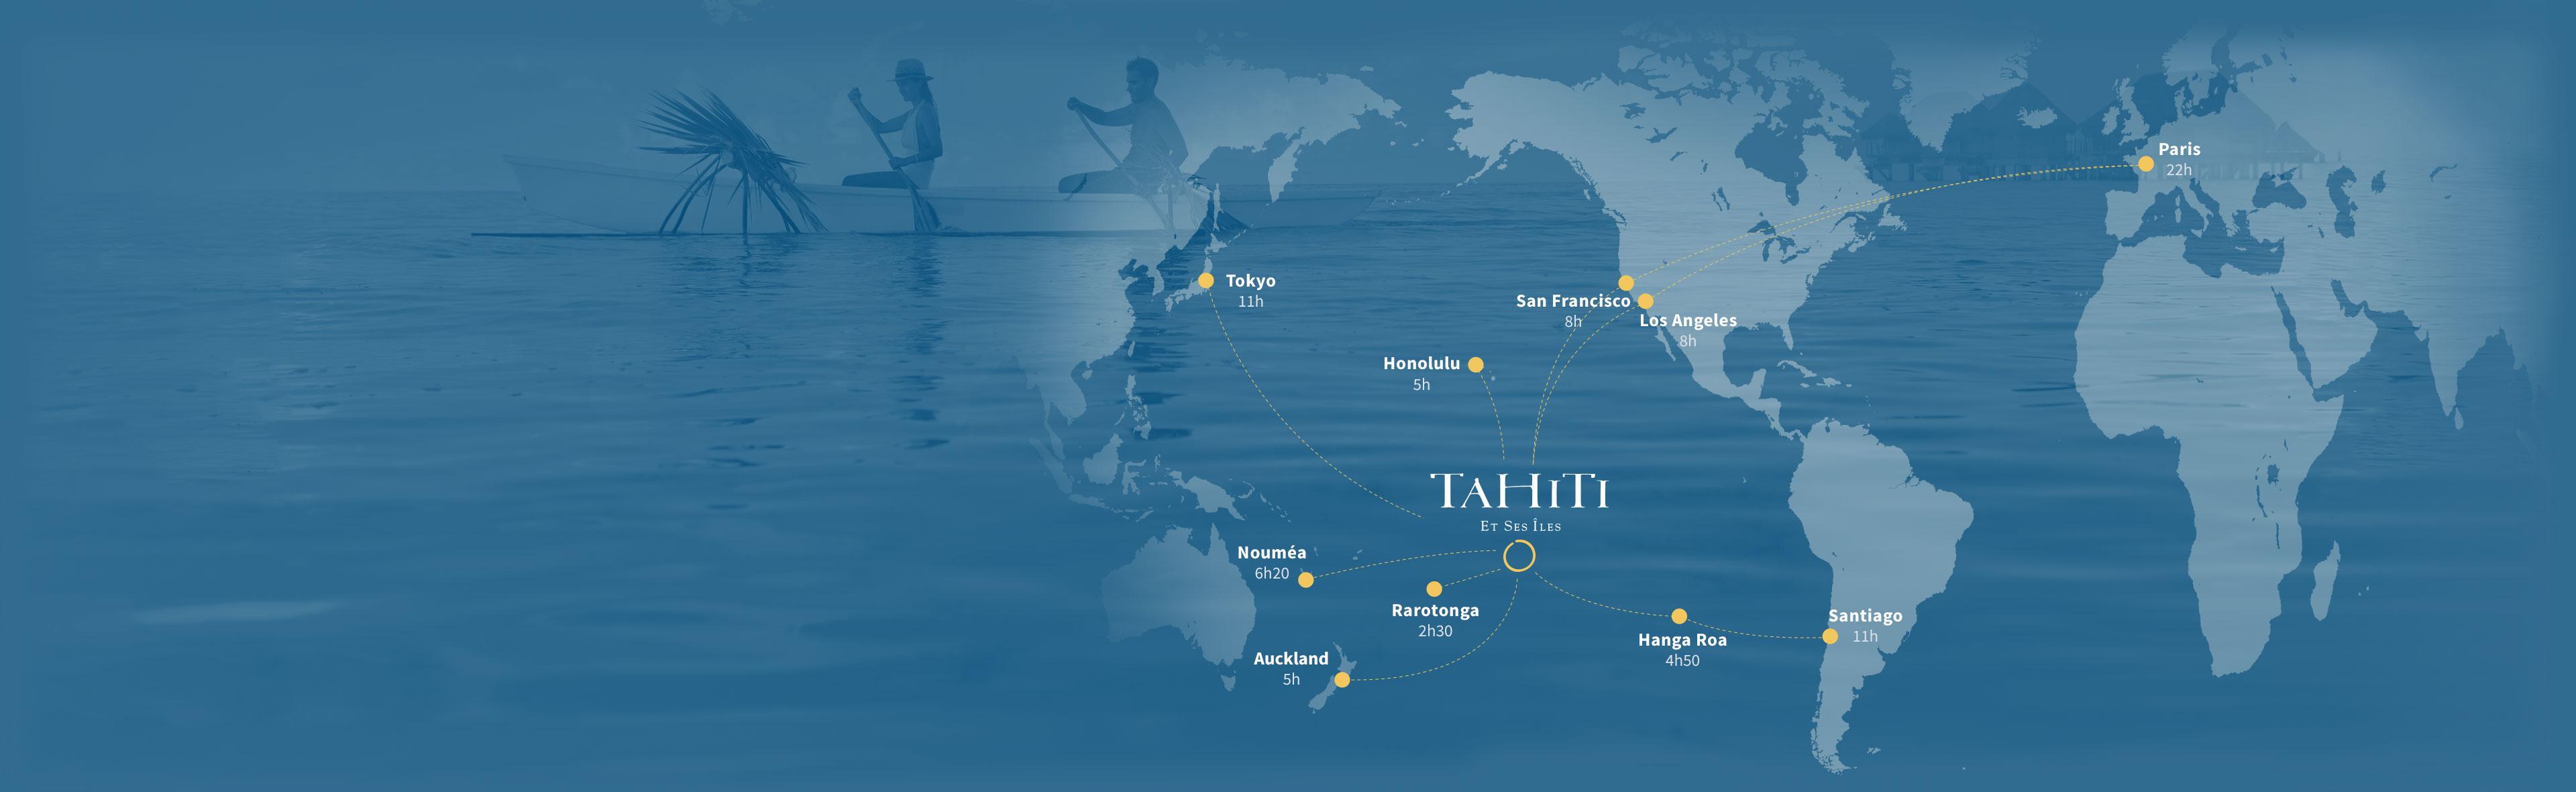 tahiti-homepage-map-d_french | Tahiti Tourisme